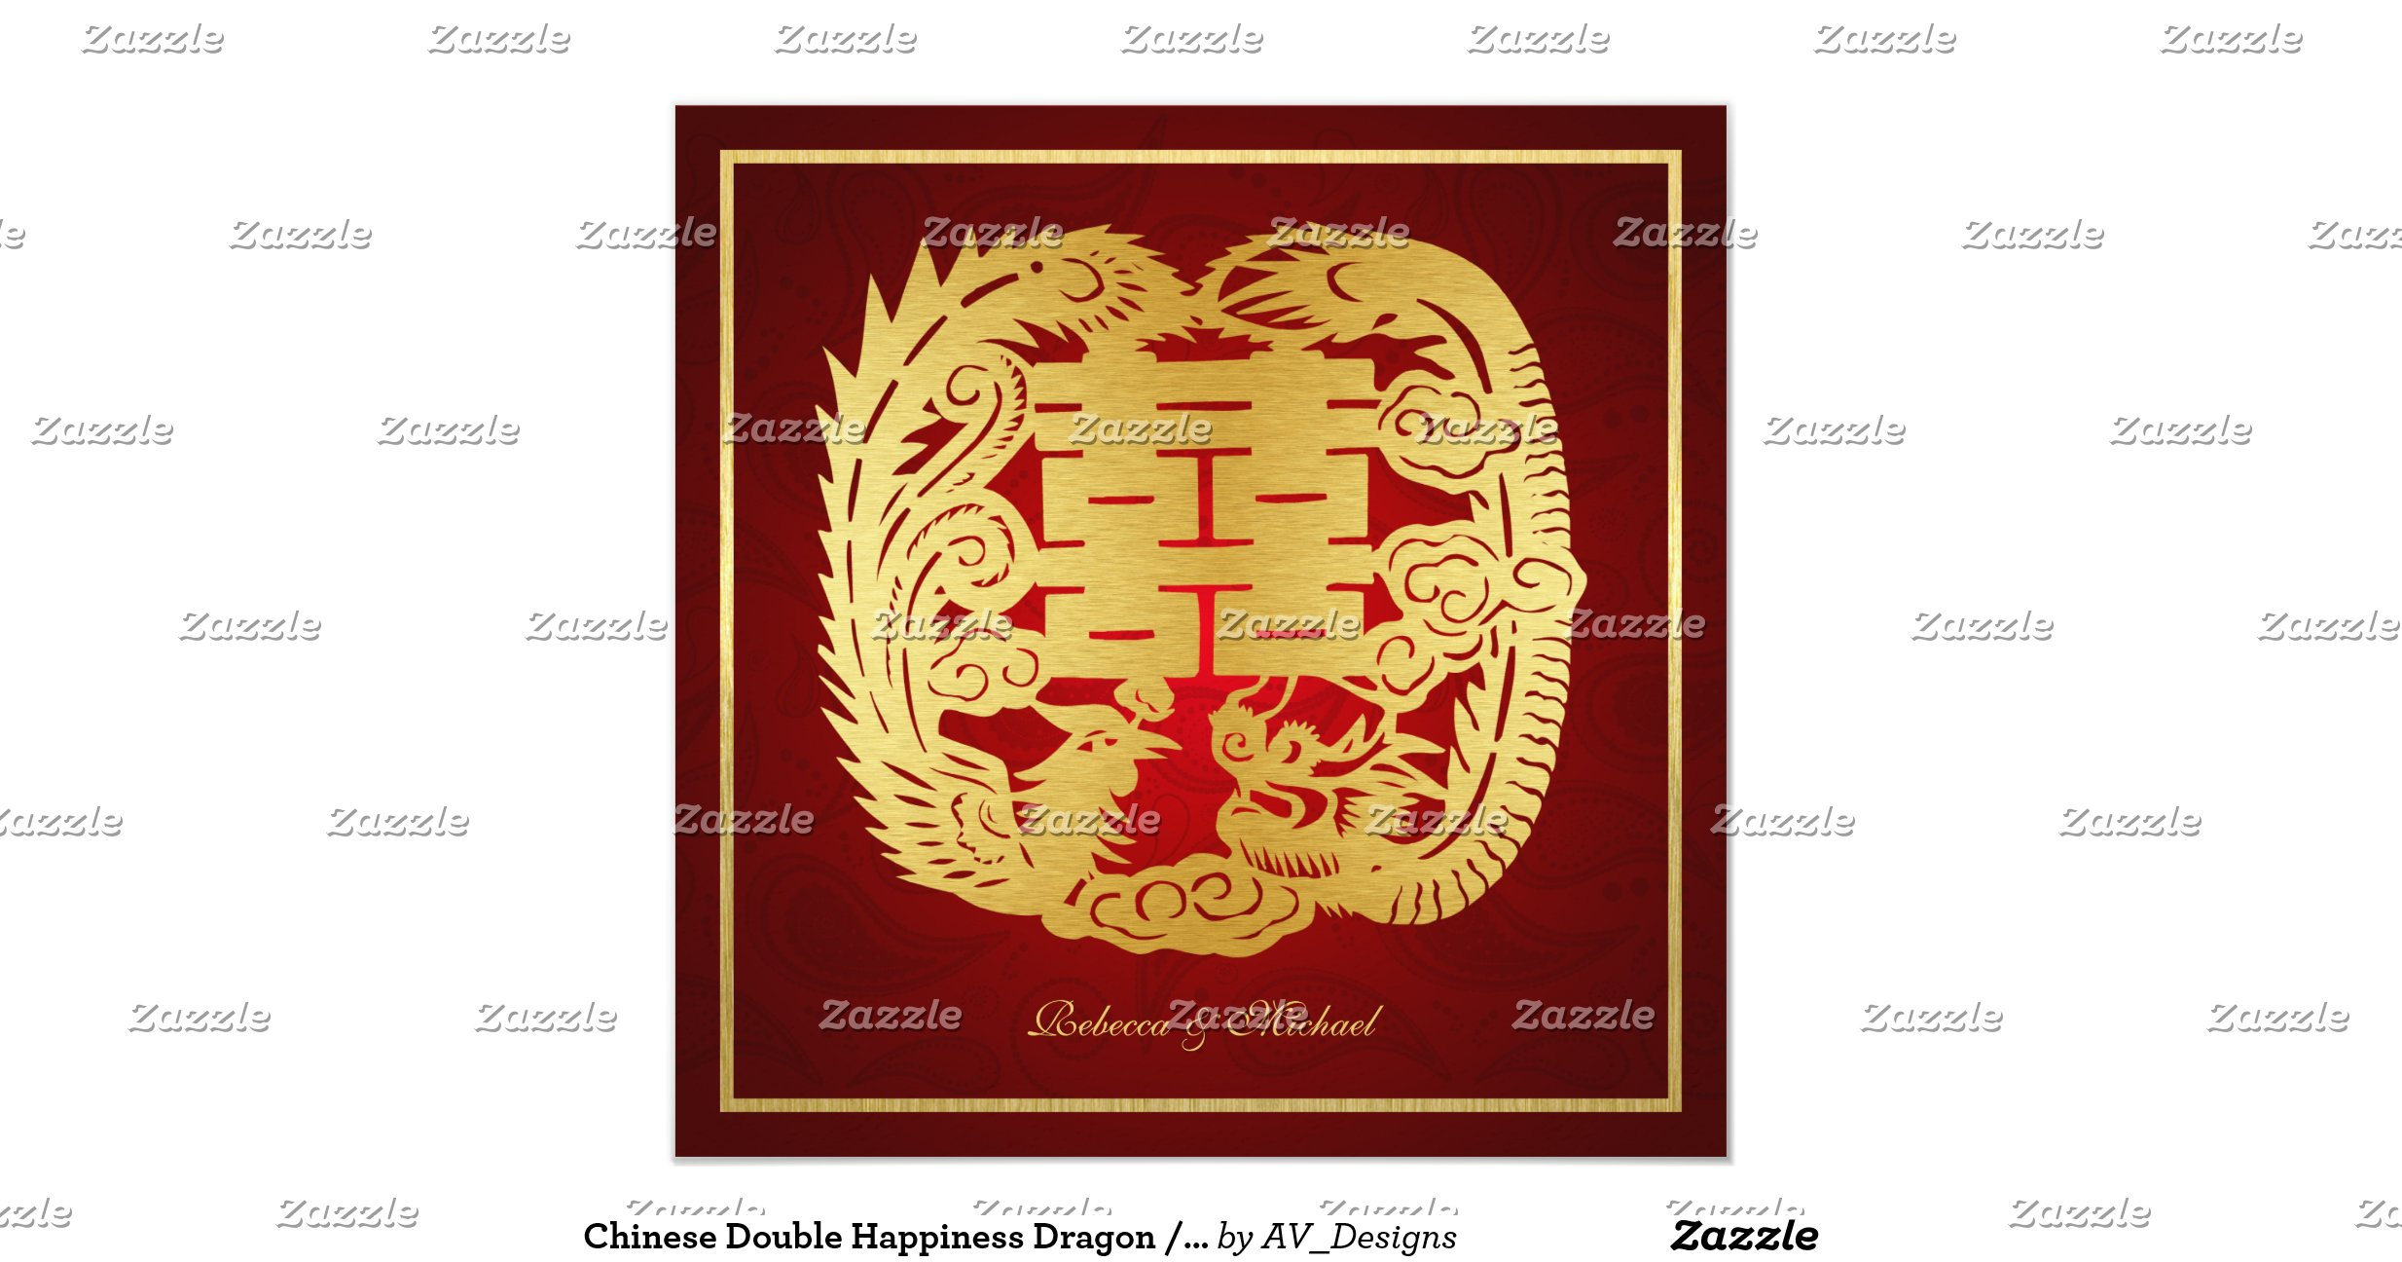 Chinese Double Happiness Dragon Phoenix Wedding Invitation R7d9bfa54aef74003b4f225e038bb03ee